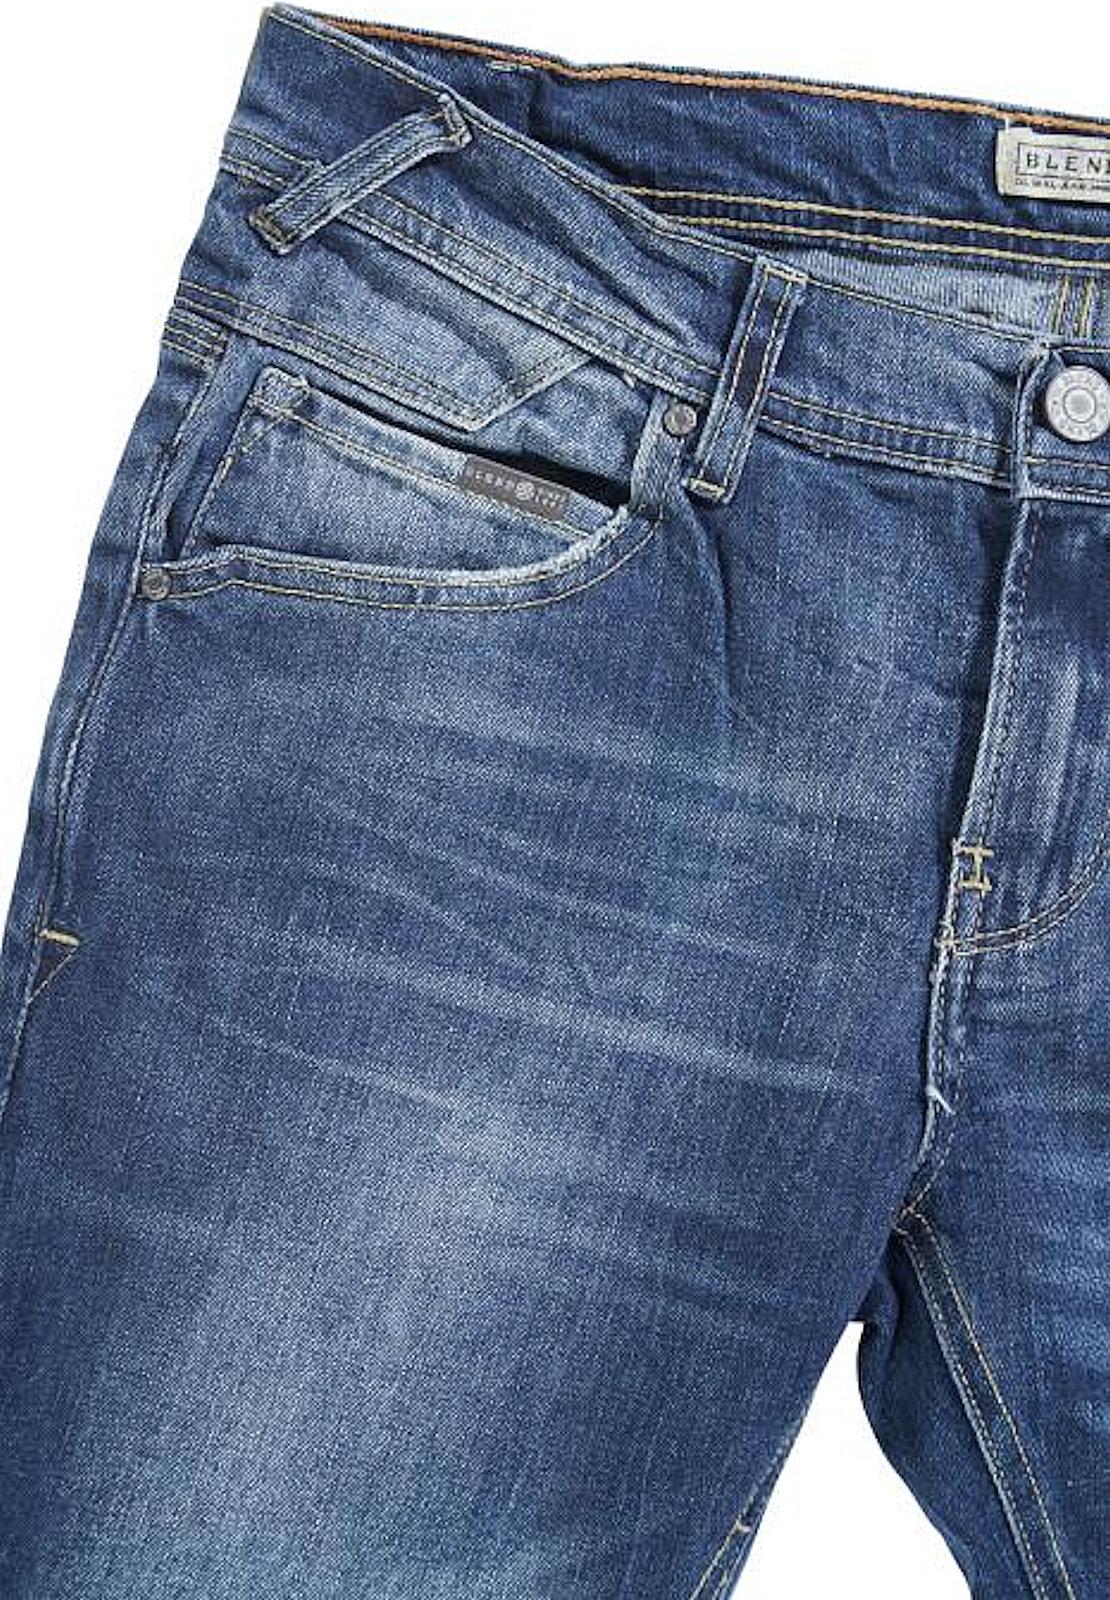 Mélange Neu 20701150 Bleu Jeans Herren Regular Tuyau Style Coupe Rock Moyen rvzgnUwxrR